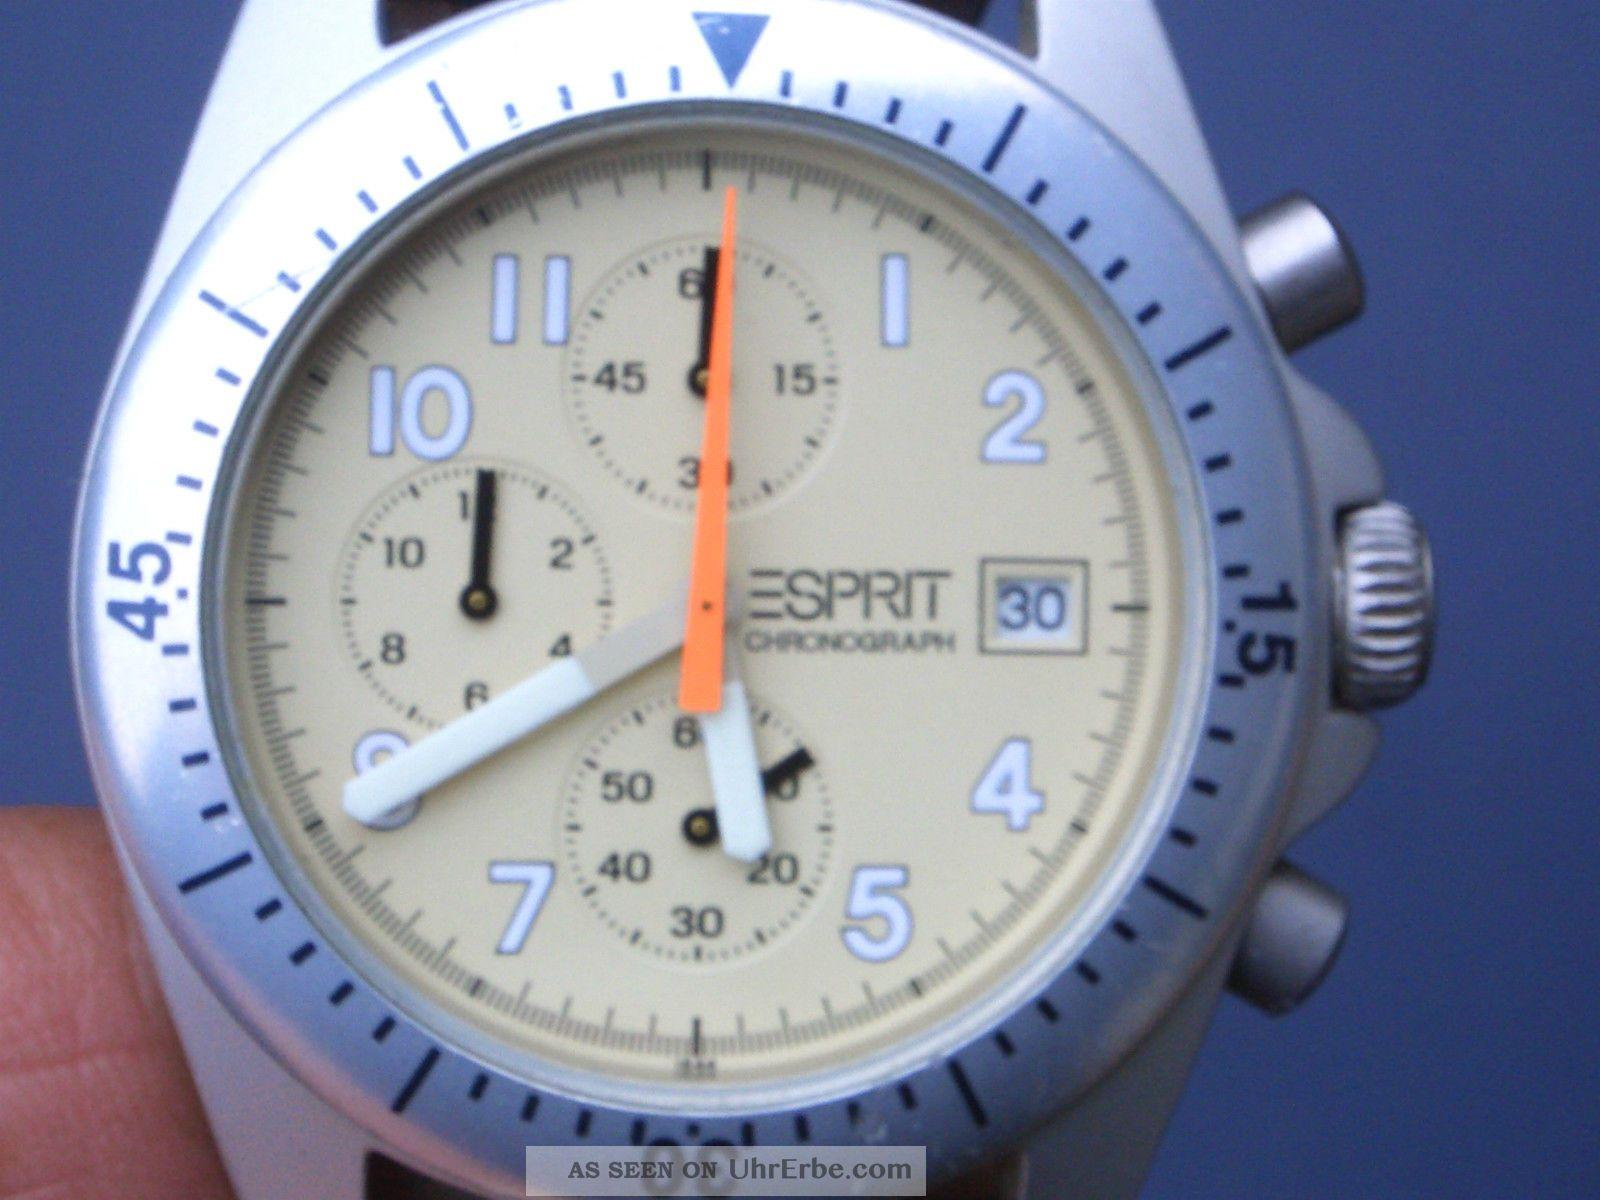 Seltener Esprit Aluminium Herren Chronograph Gut Erhalten Alle Funktionen Laufen Armbanduhren Bild